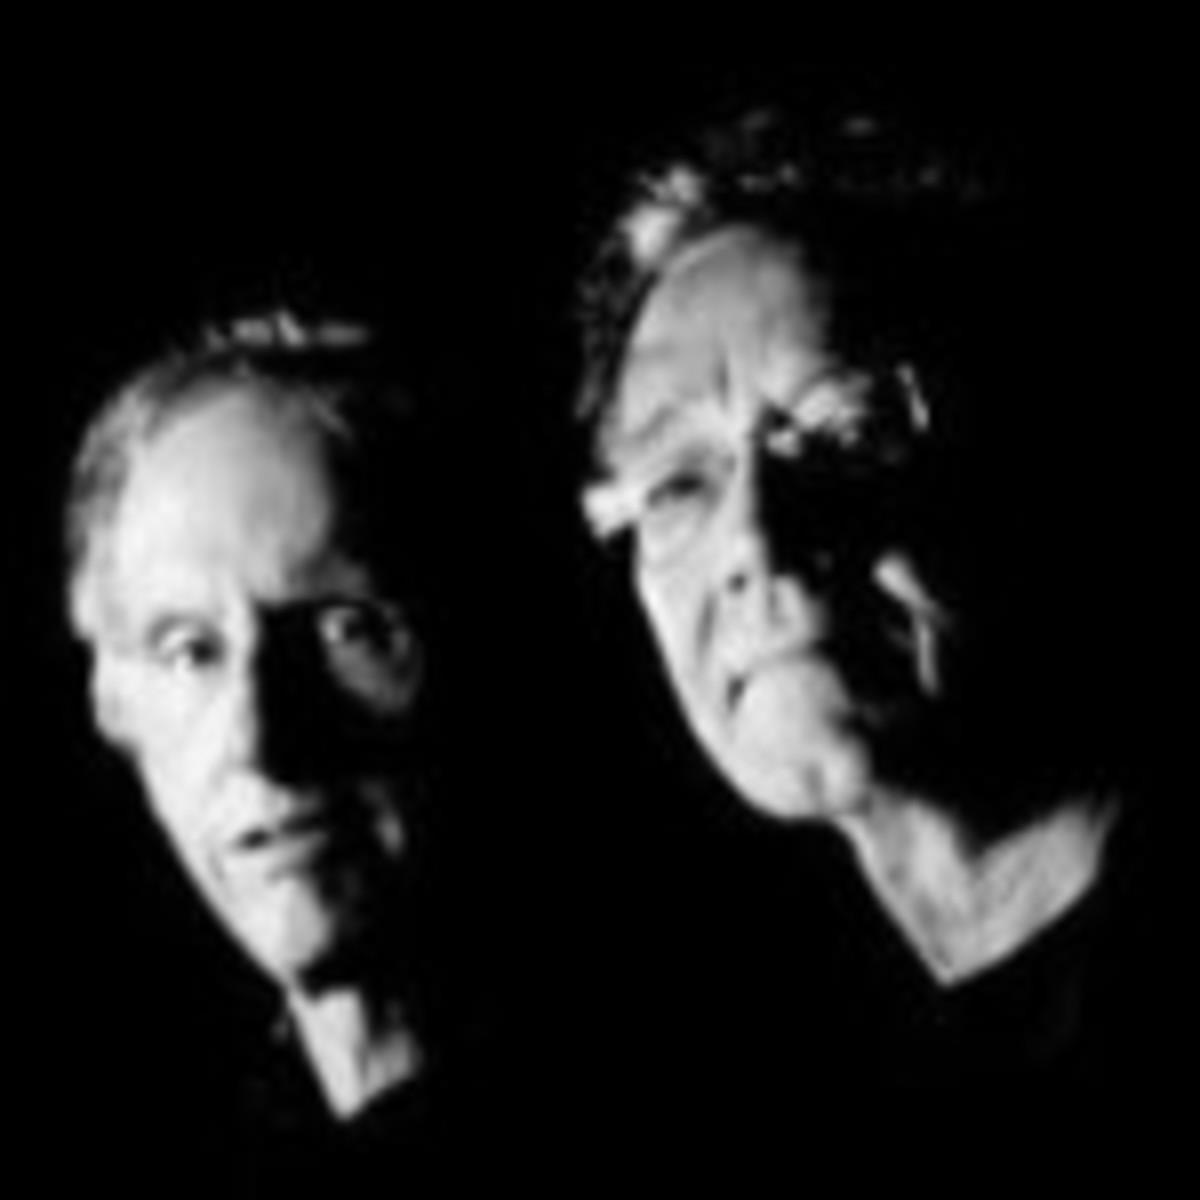 Robby Krieger (left) and Ray Manzarek